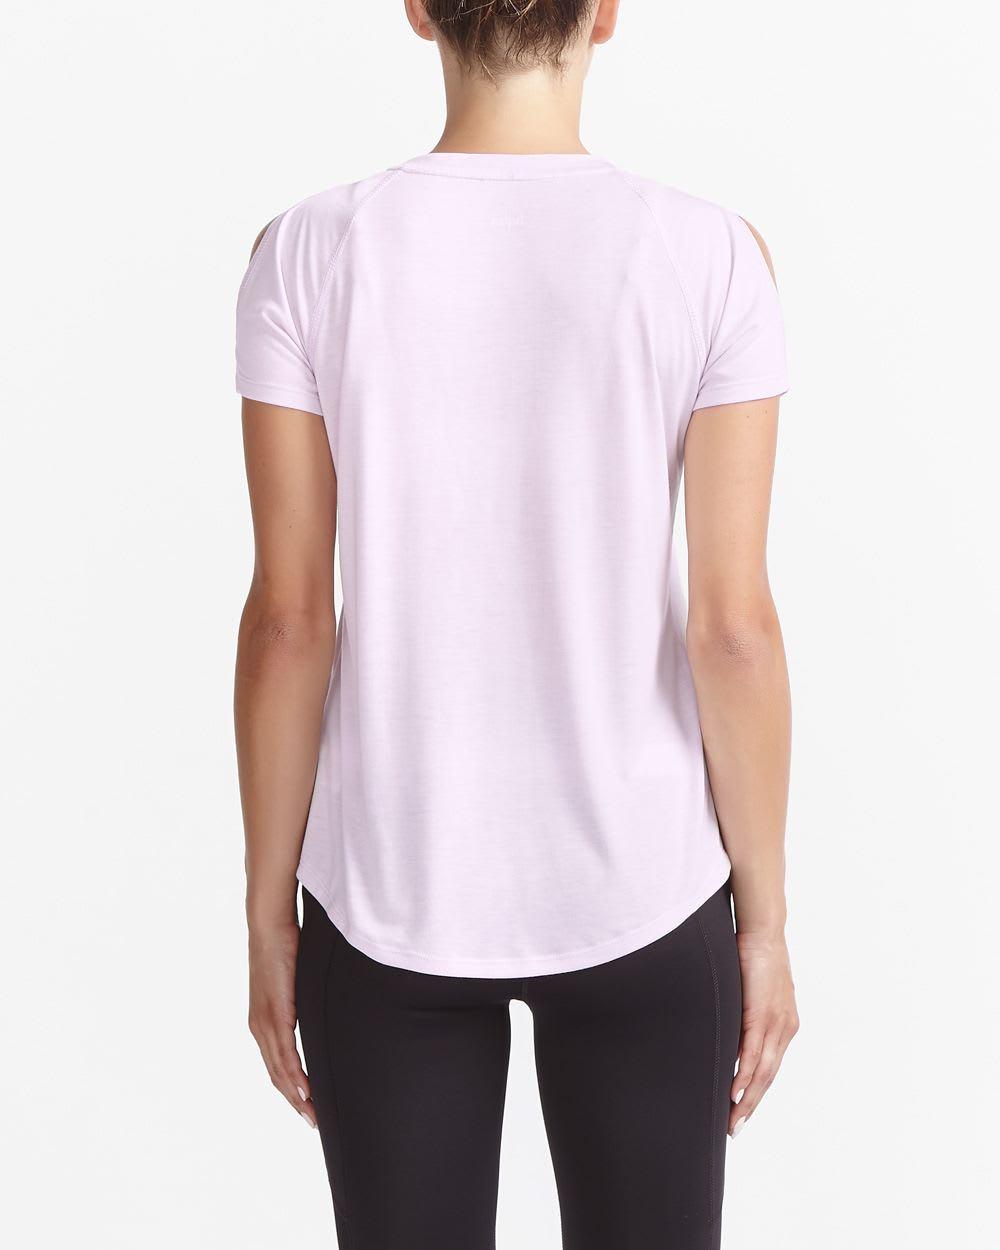 Hyba Graphic Yoga T-Shirt